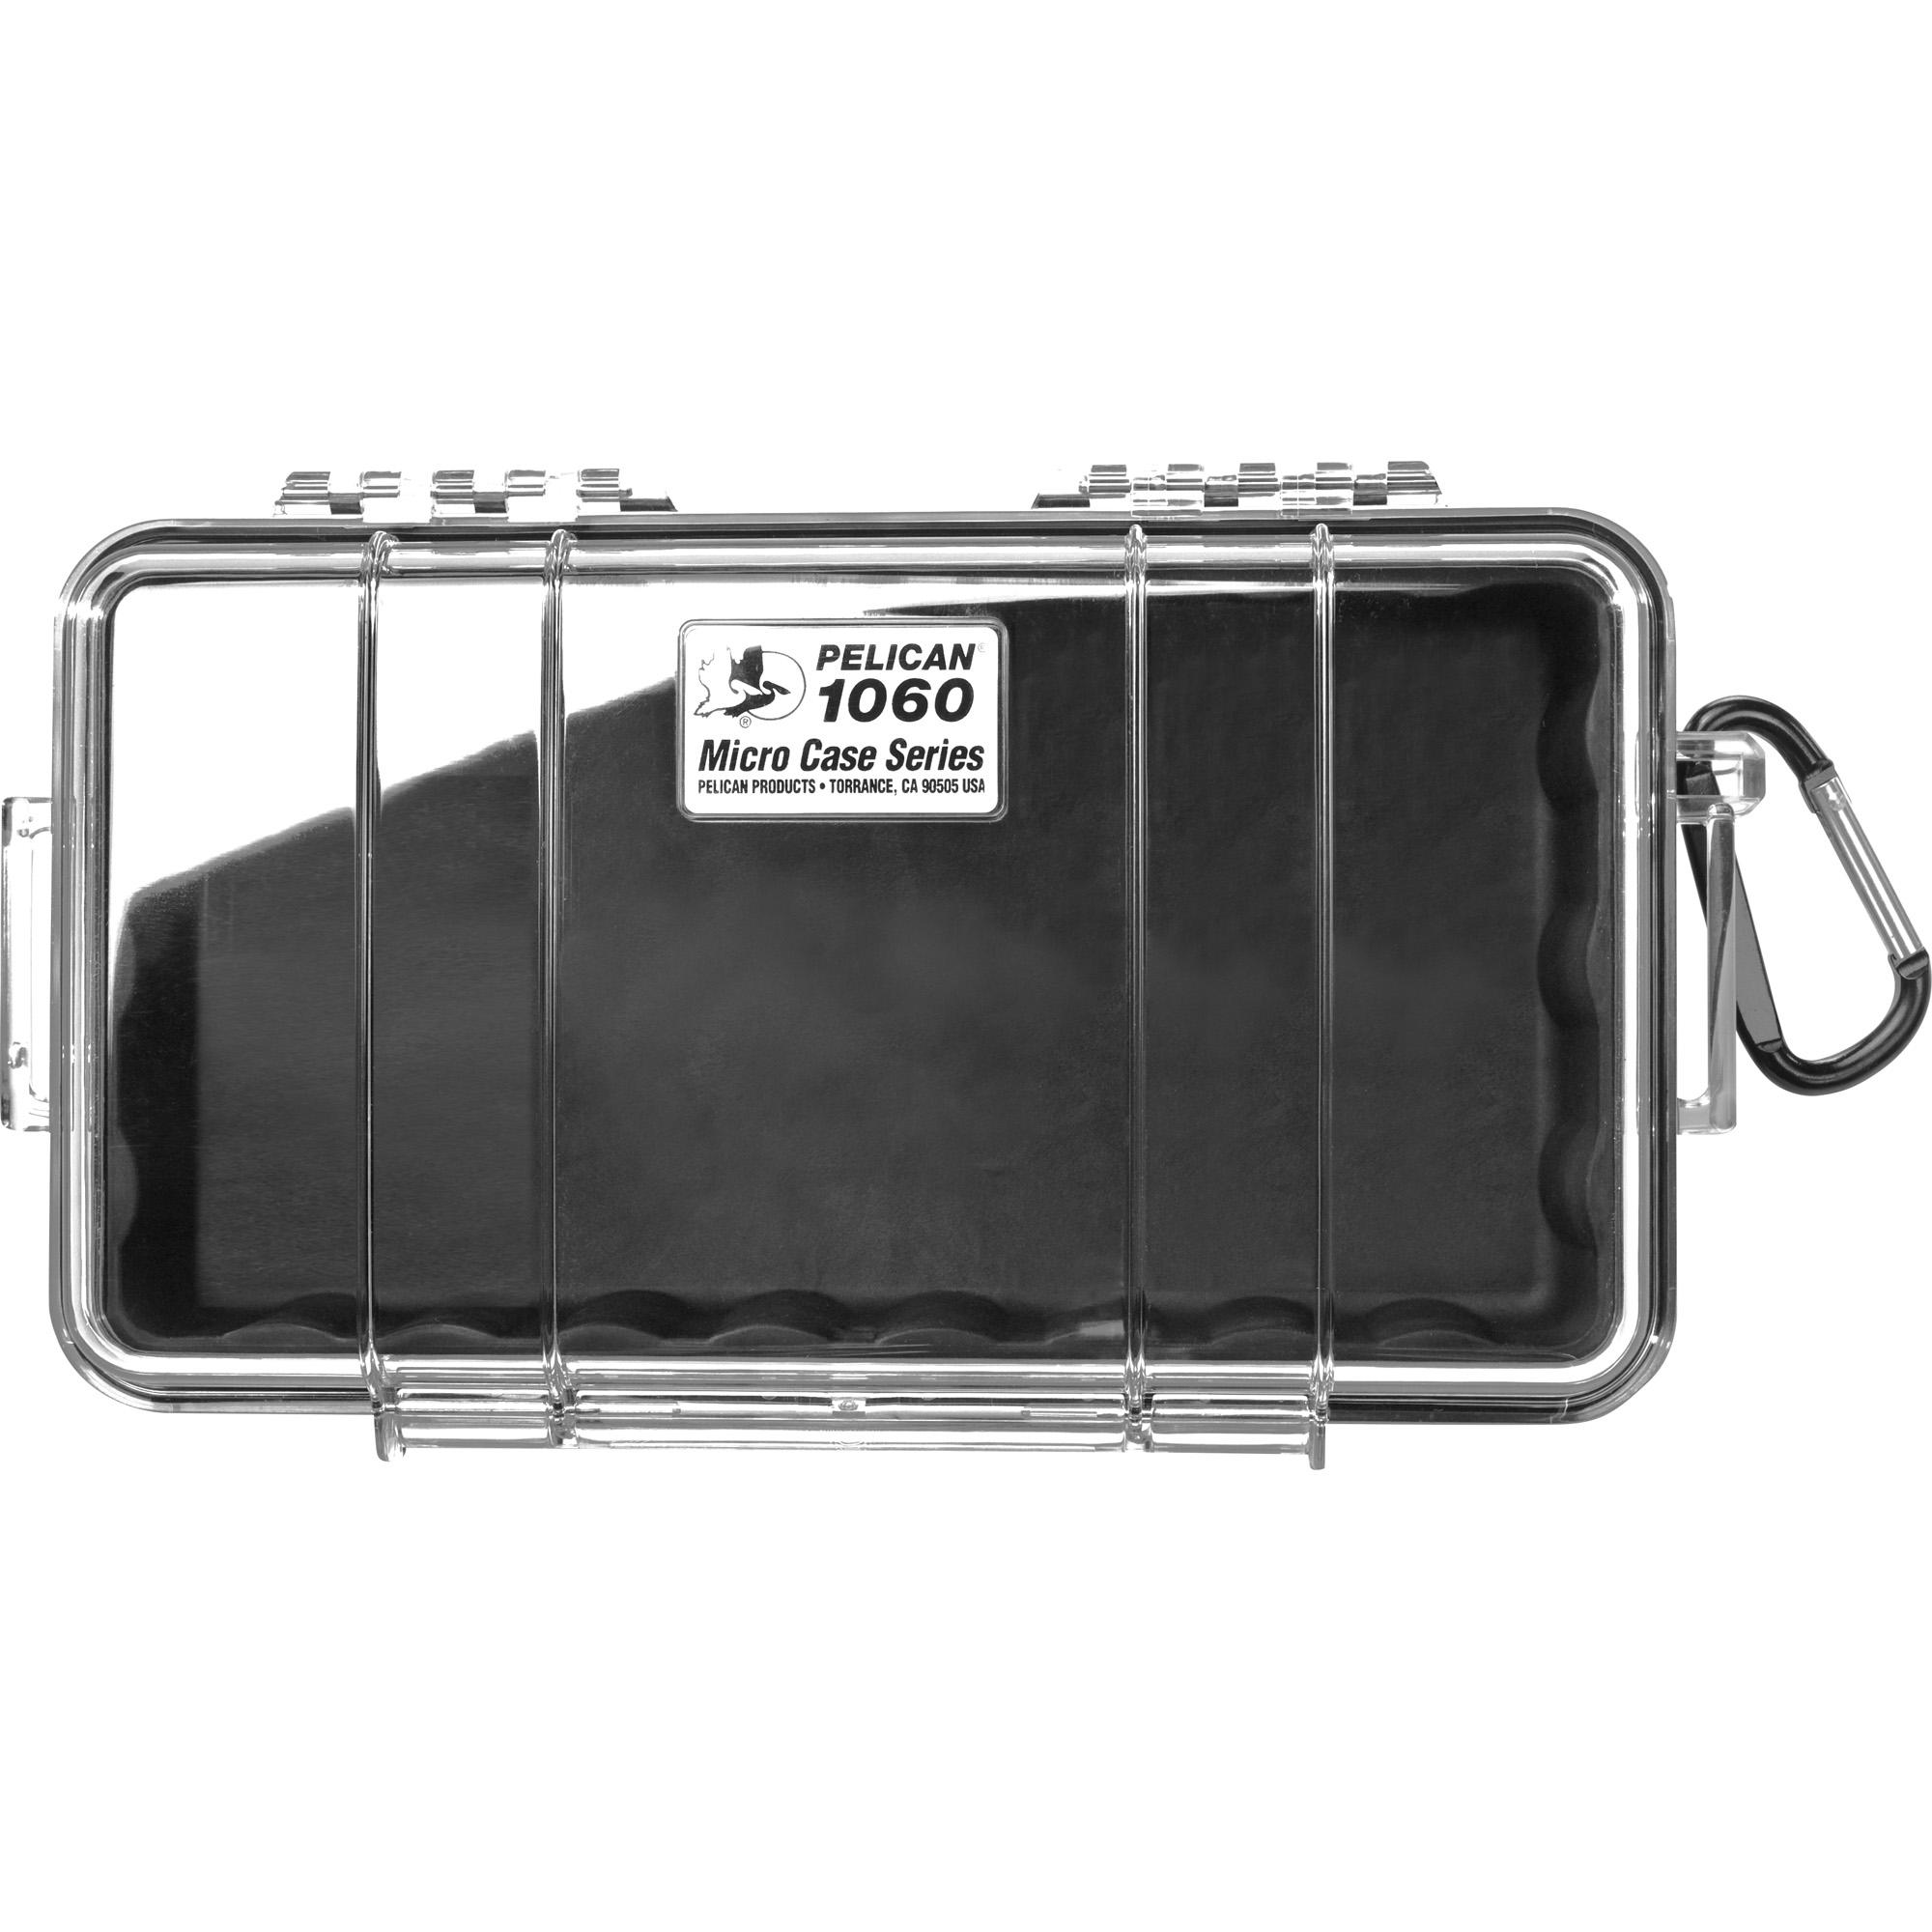 Pelican 1060 Micro Case Wl/wi-bk Clr